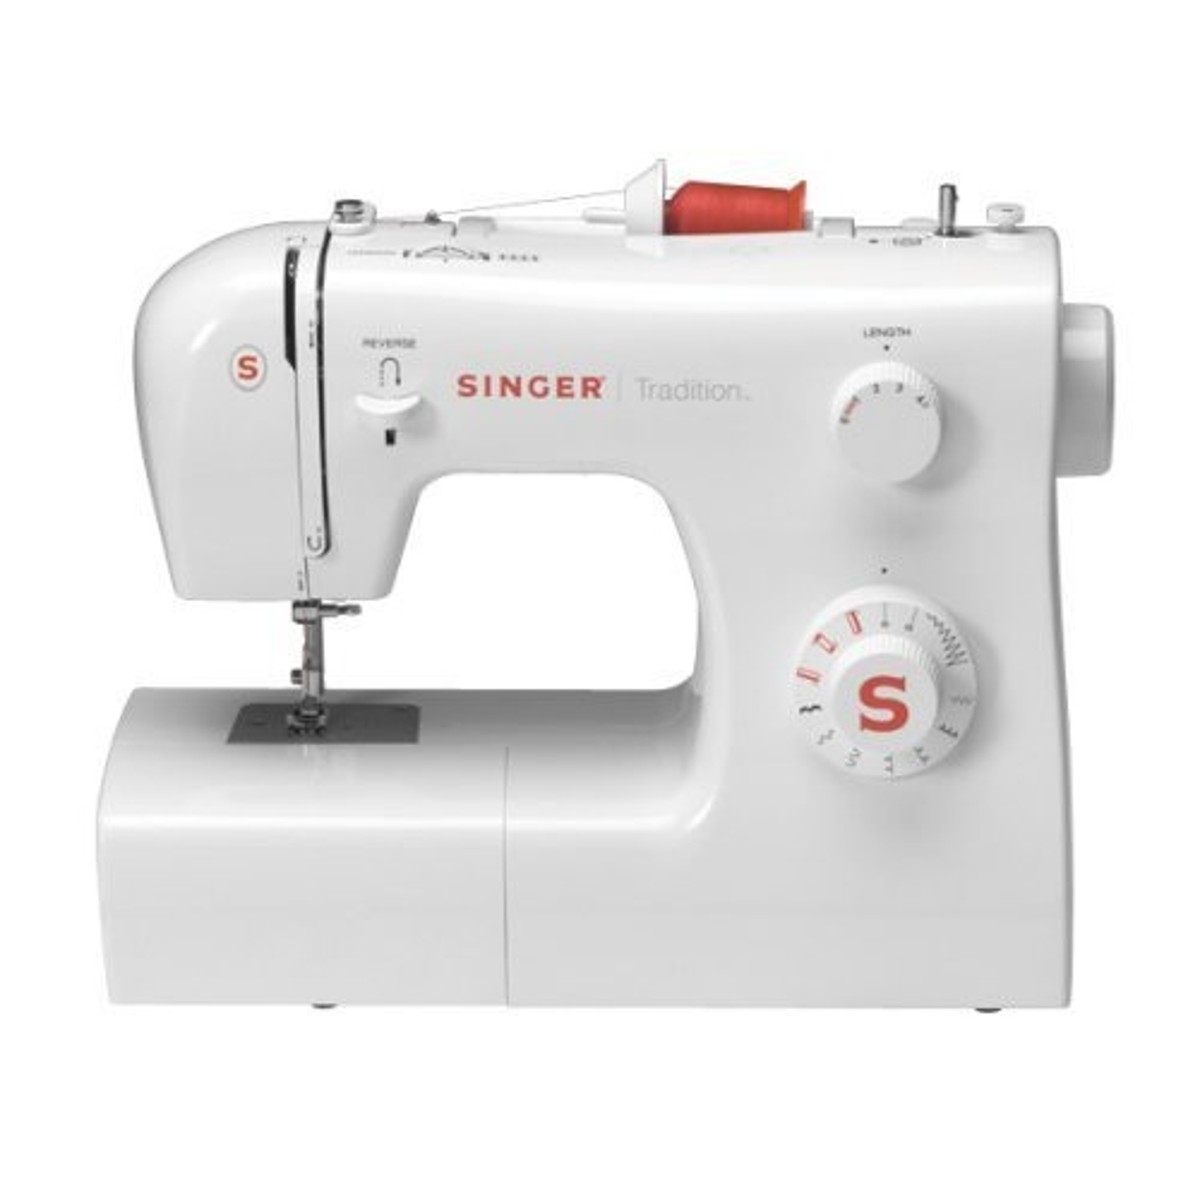 singer sewing machine price guide